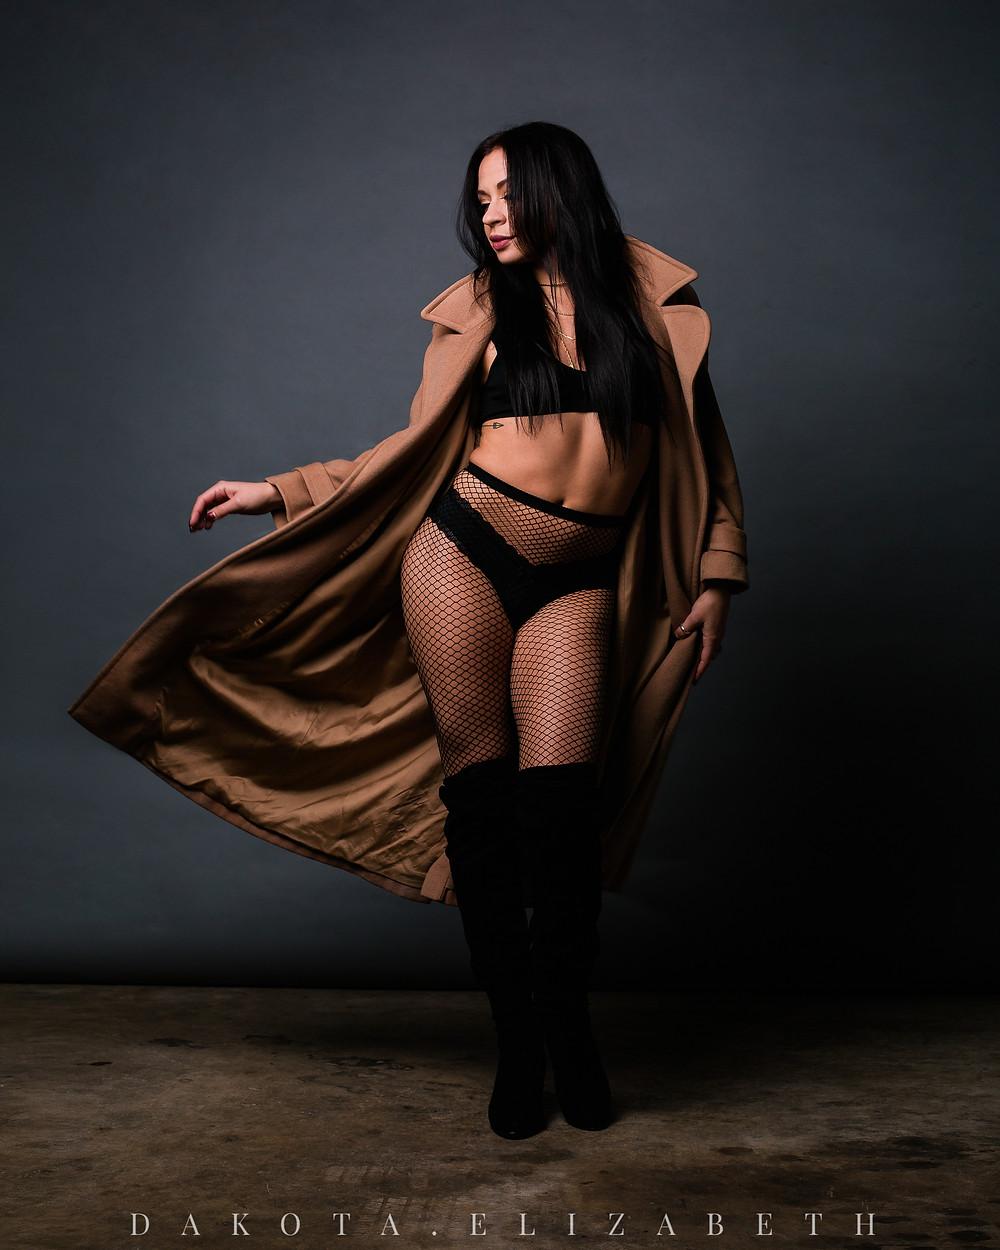 By Seattle Dance and Portrait Photographer, Dakota Elizabeth, LLC